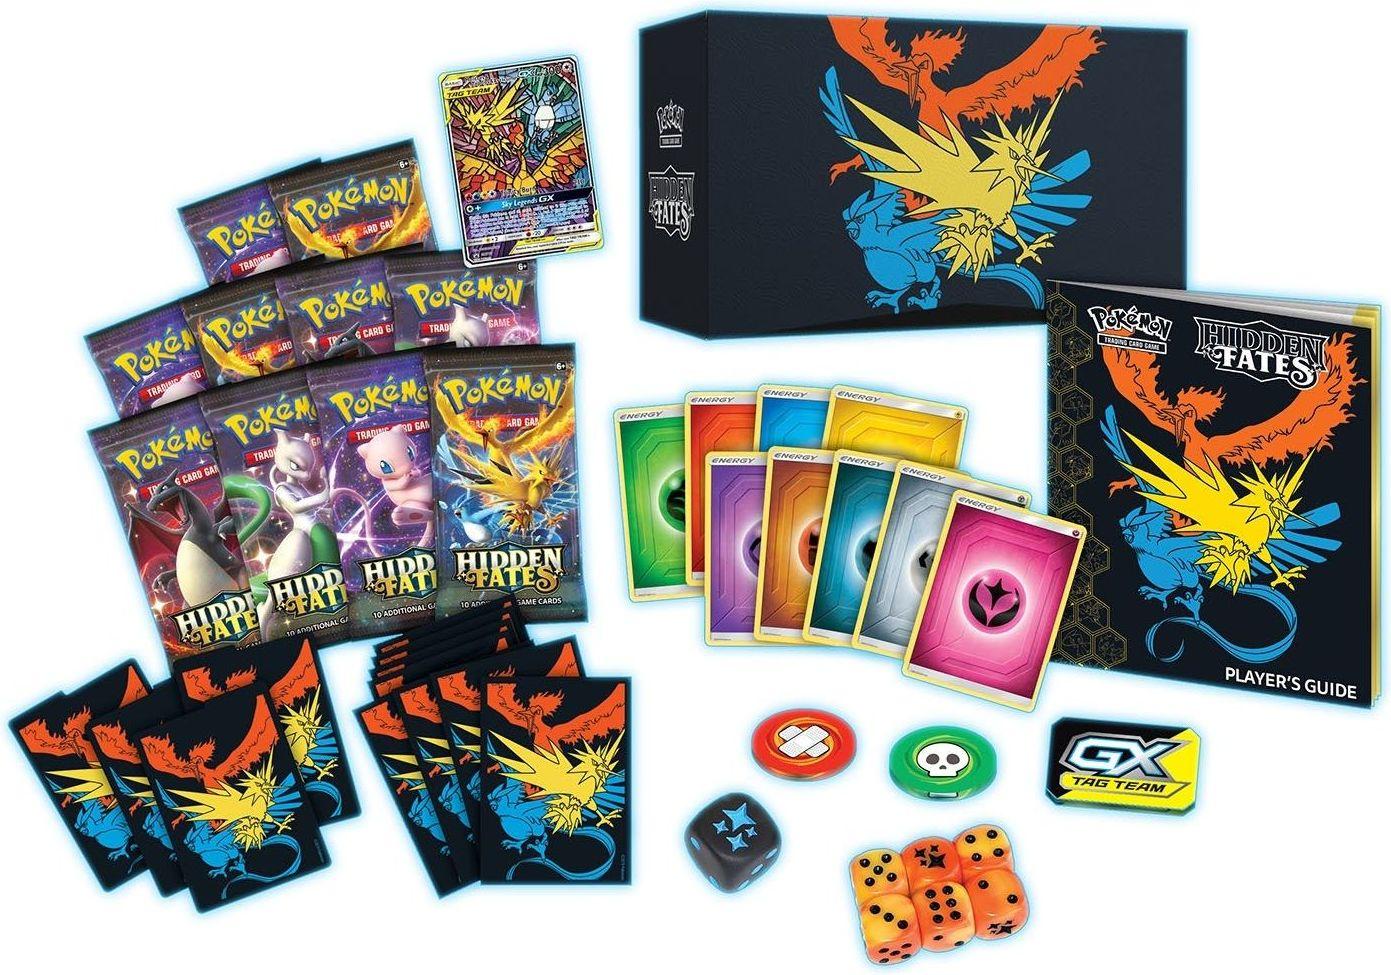 Pokémon TCG: Hidden Fates Elite Trainer Box components